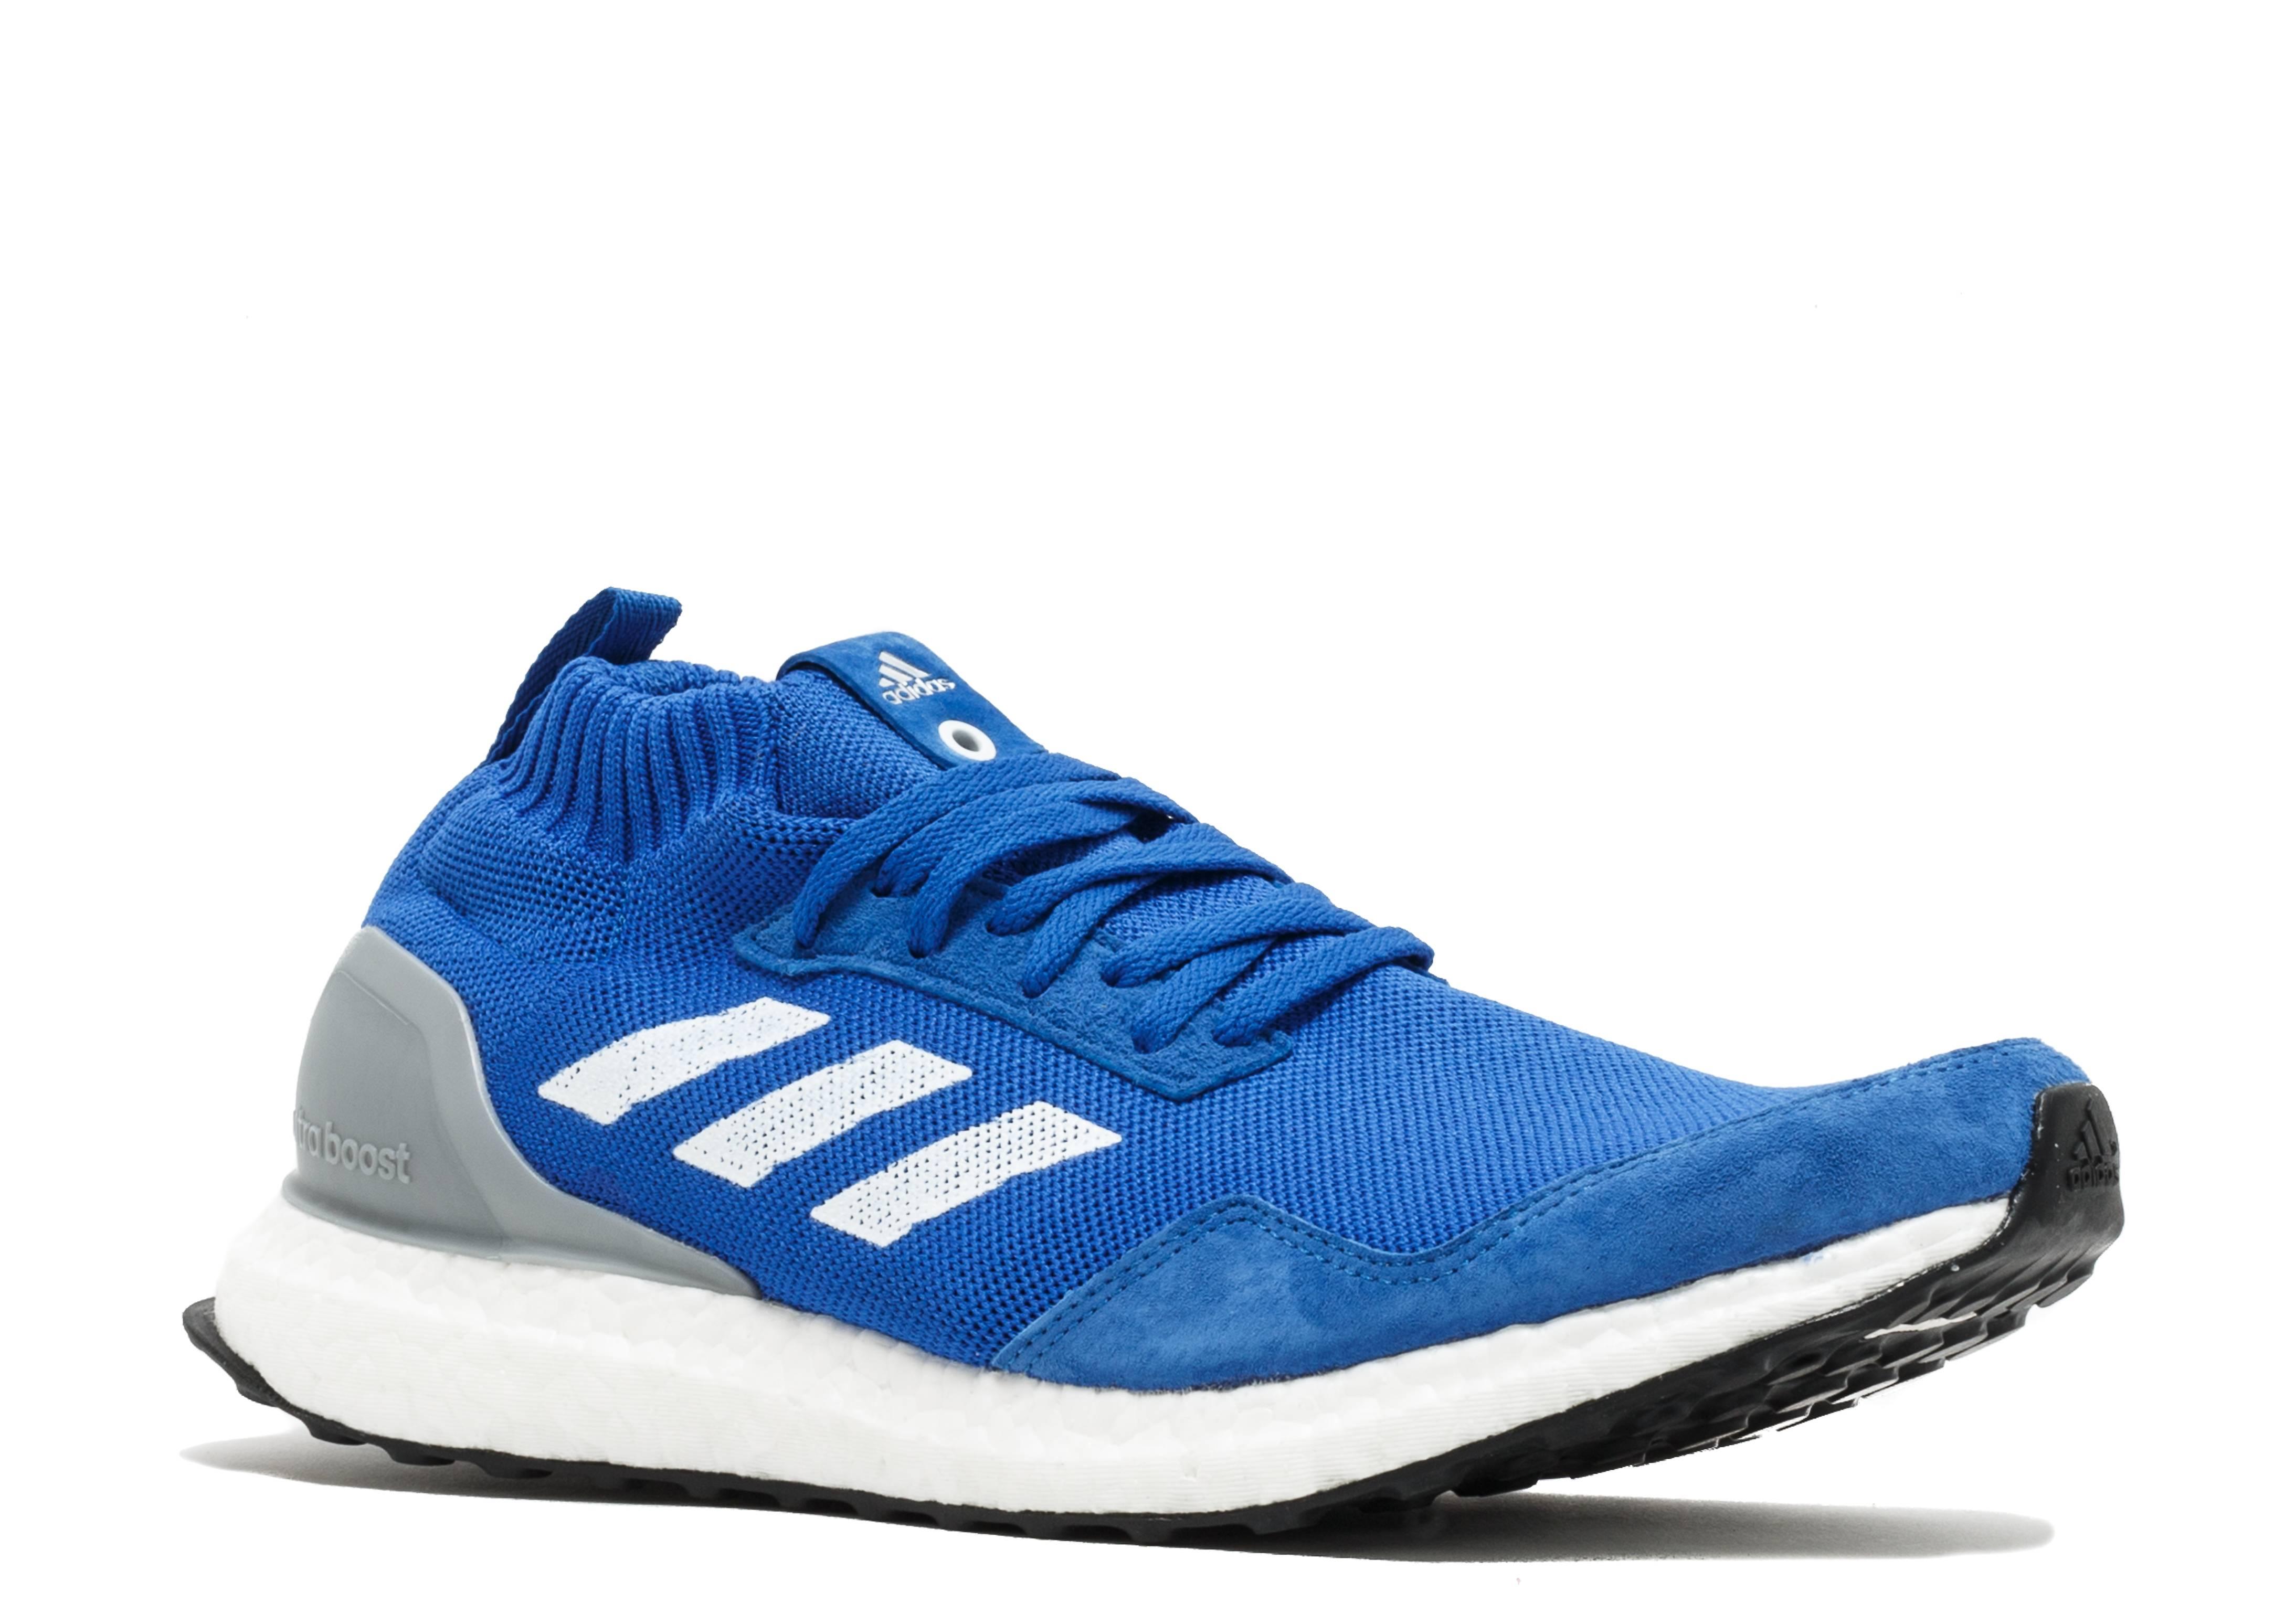 Ultra Boost Mid Run Thru Time Adidas by3056 royal